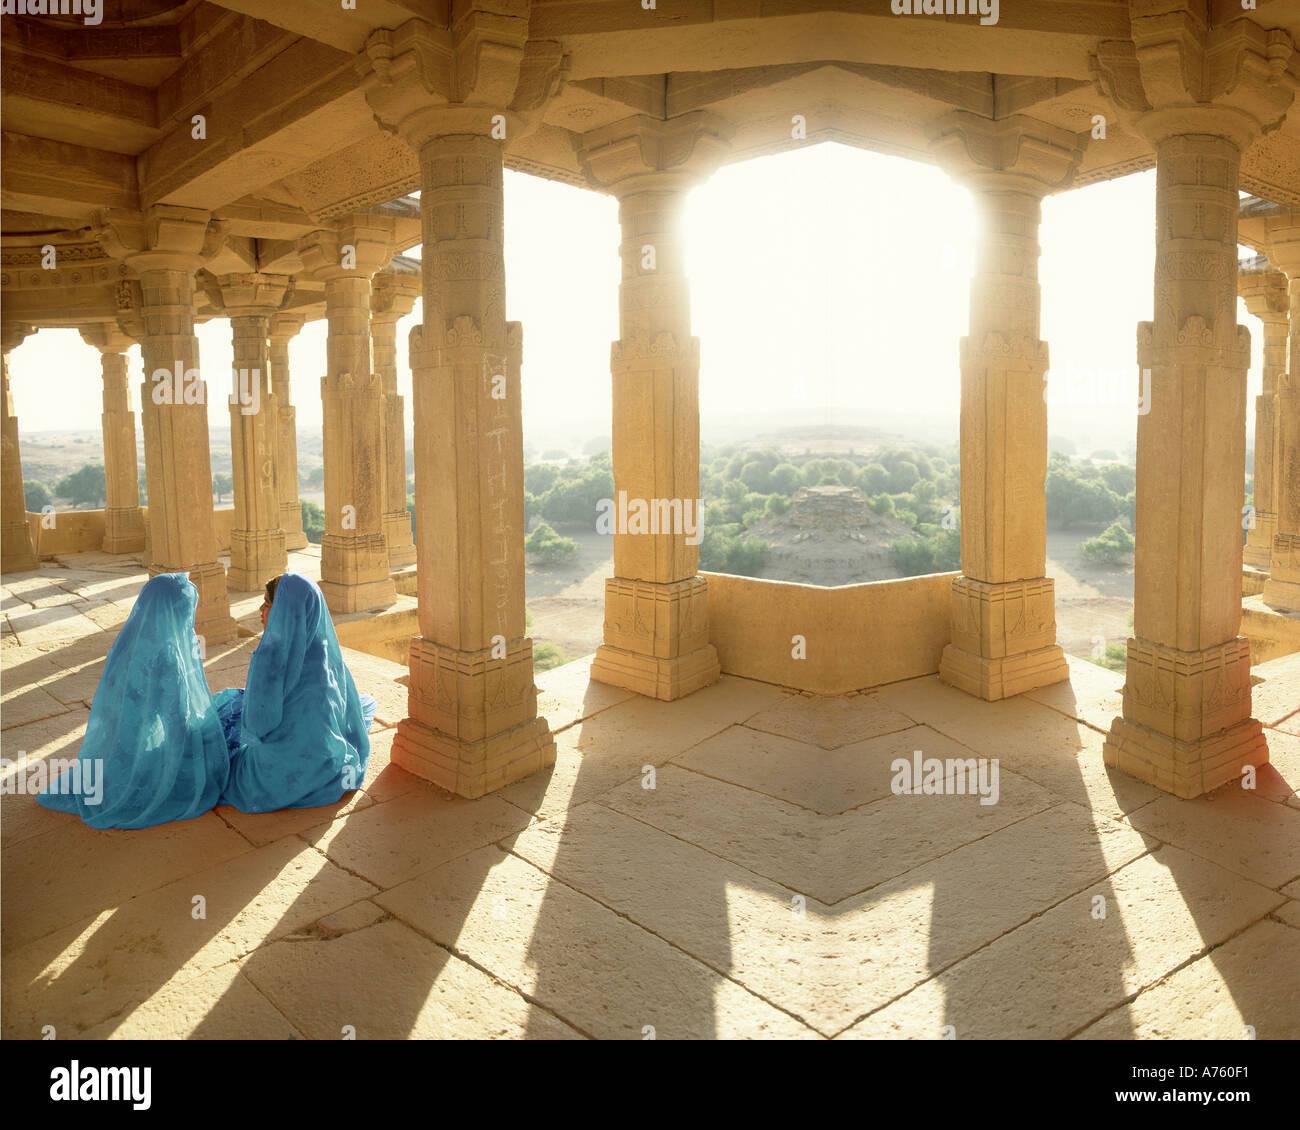 Le donne indiane, Jaiselmer, Rajasthan, India Immagini Stock